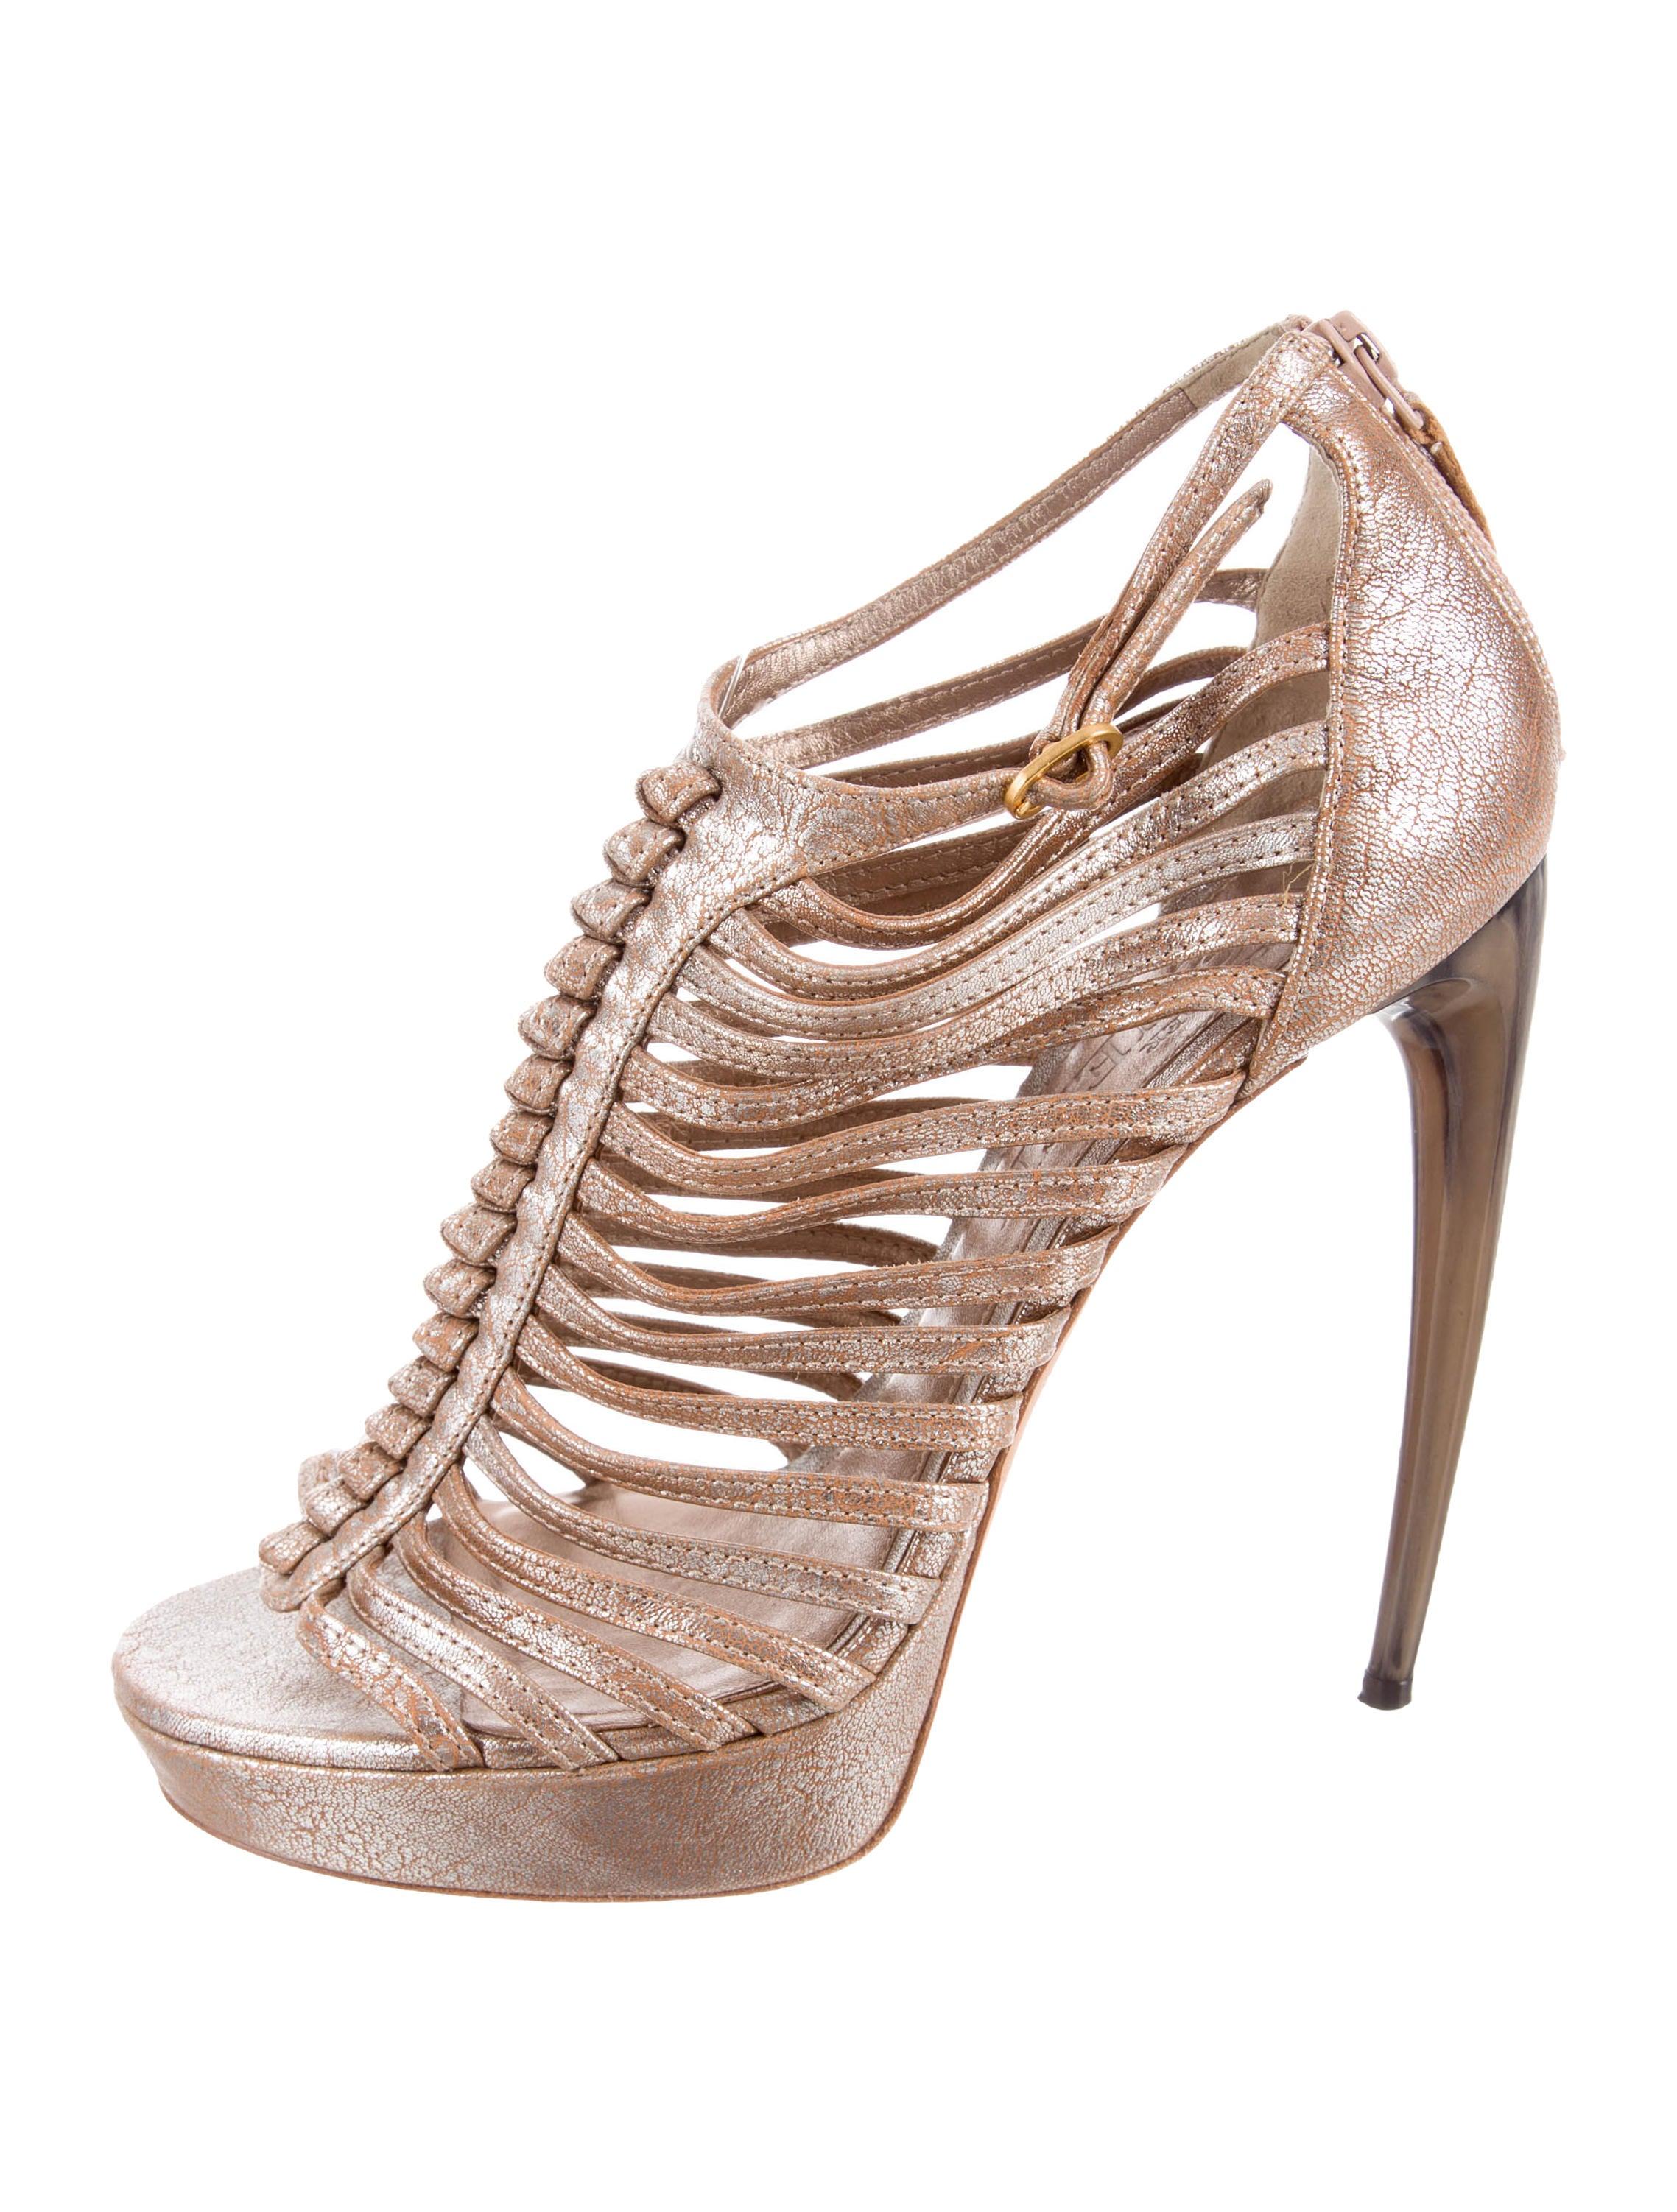 Cheap Sale Popular Lowest Price Online Cage sandals - Metallic Alexander McQueen Buy Cheap With Credit Card Discount Deals xiiihk